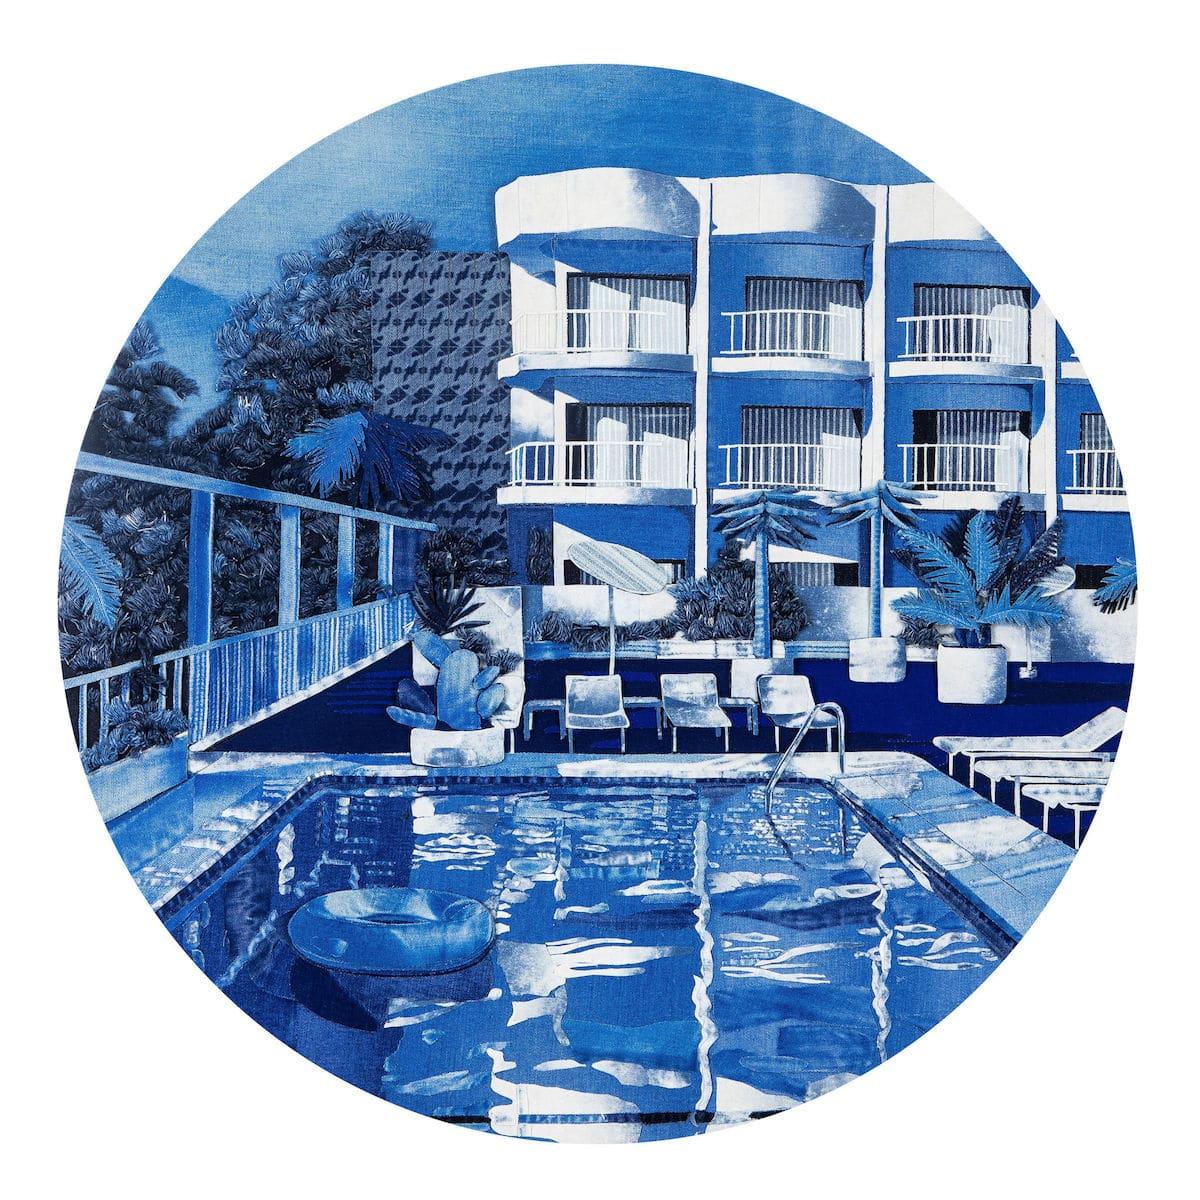 Ian-Berry-Denim-Art-Hotel-California-3